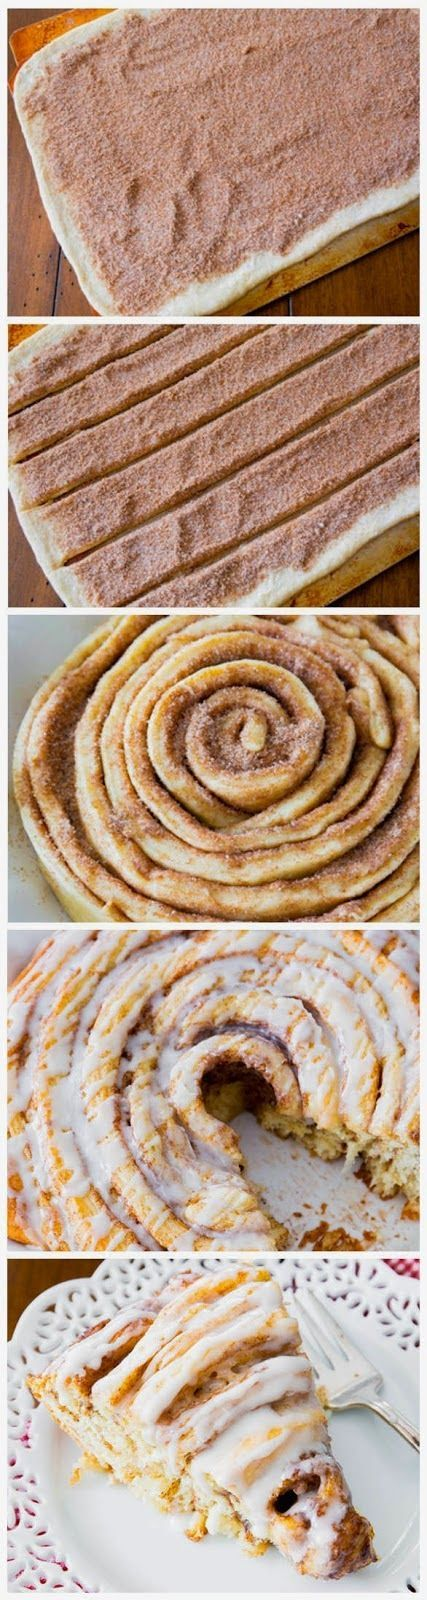 Giant Cinnamon Roll Cake   Food Blog